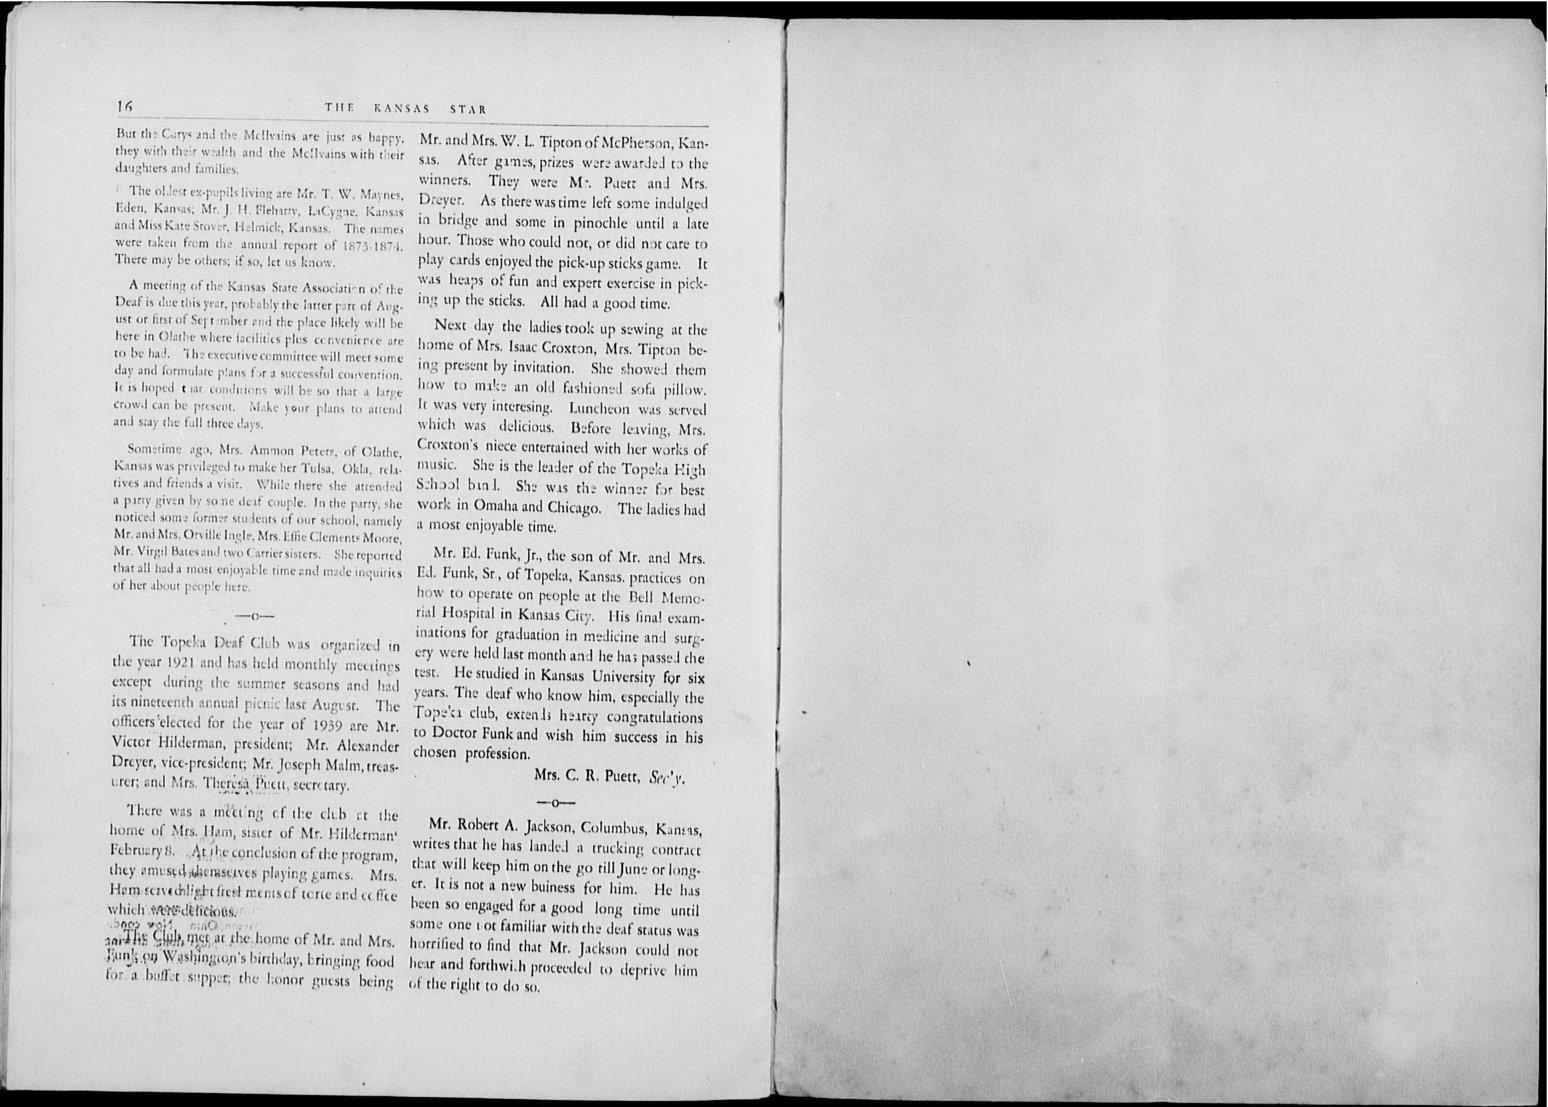 The Kansas Star, volume 52, number 6 - 16-Blank